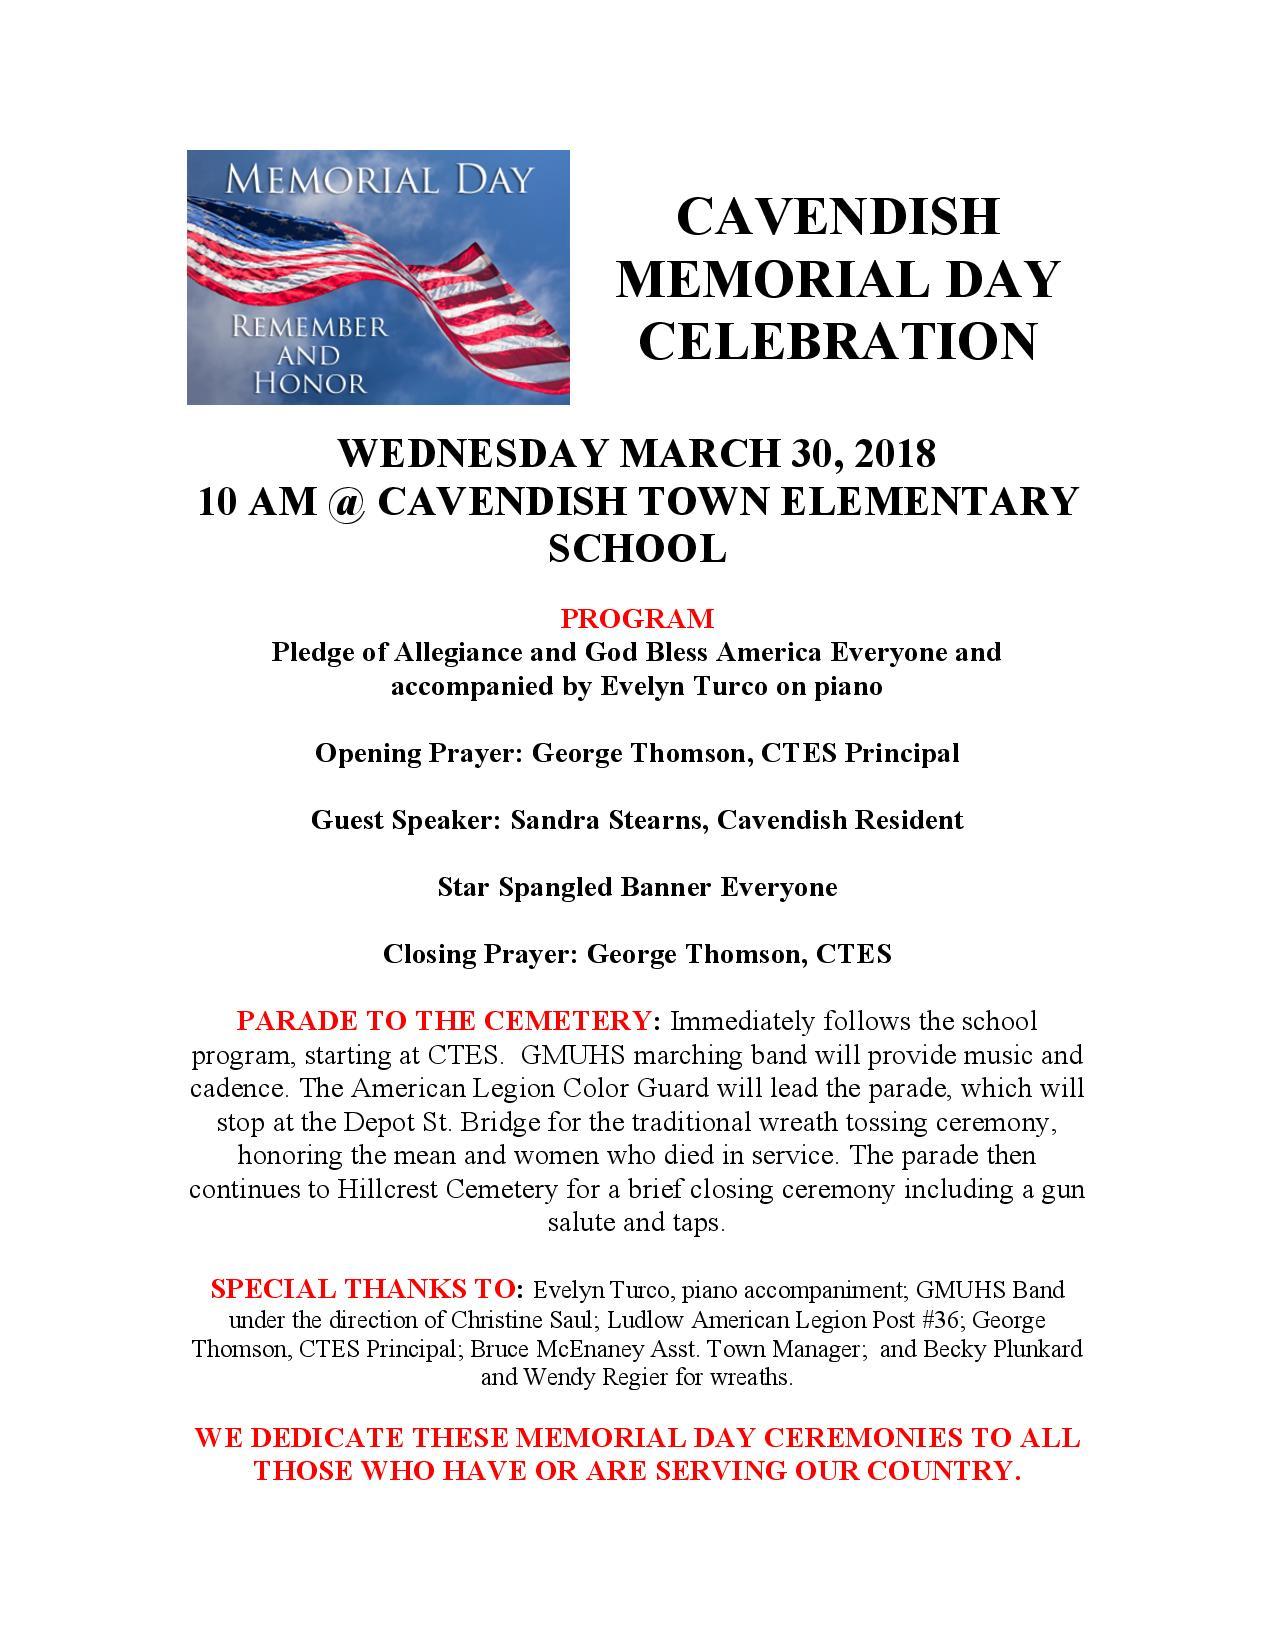 memorial Day 2018 PDF-page-001.jpg